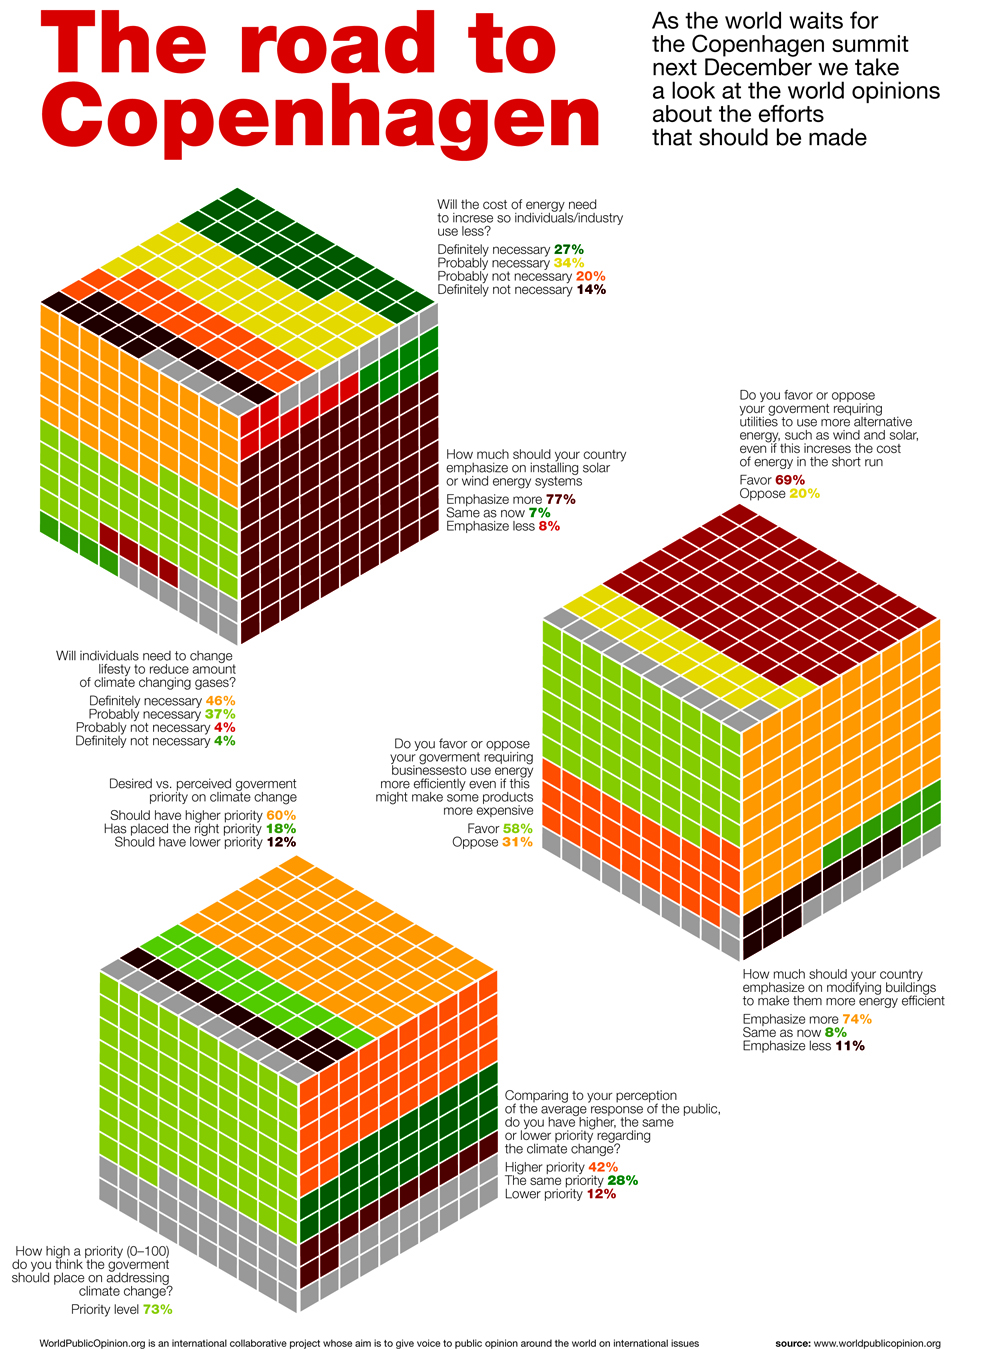 Climate change survey results peltier tech blog iso cub pie chart survey results nvjuhfo Images